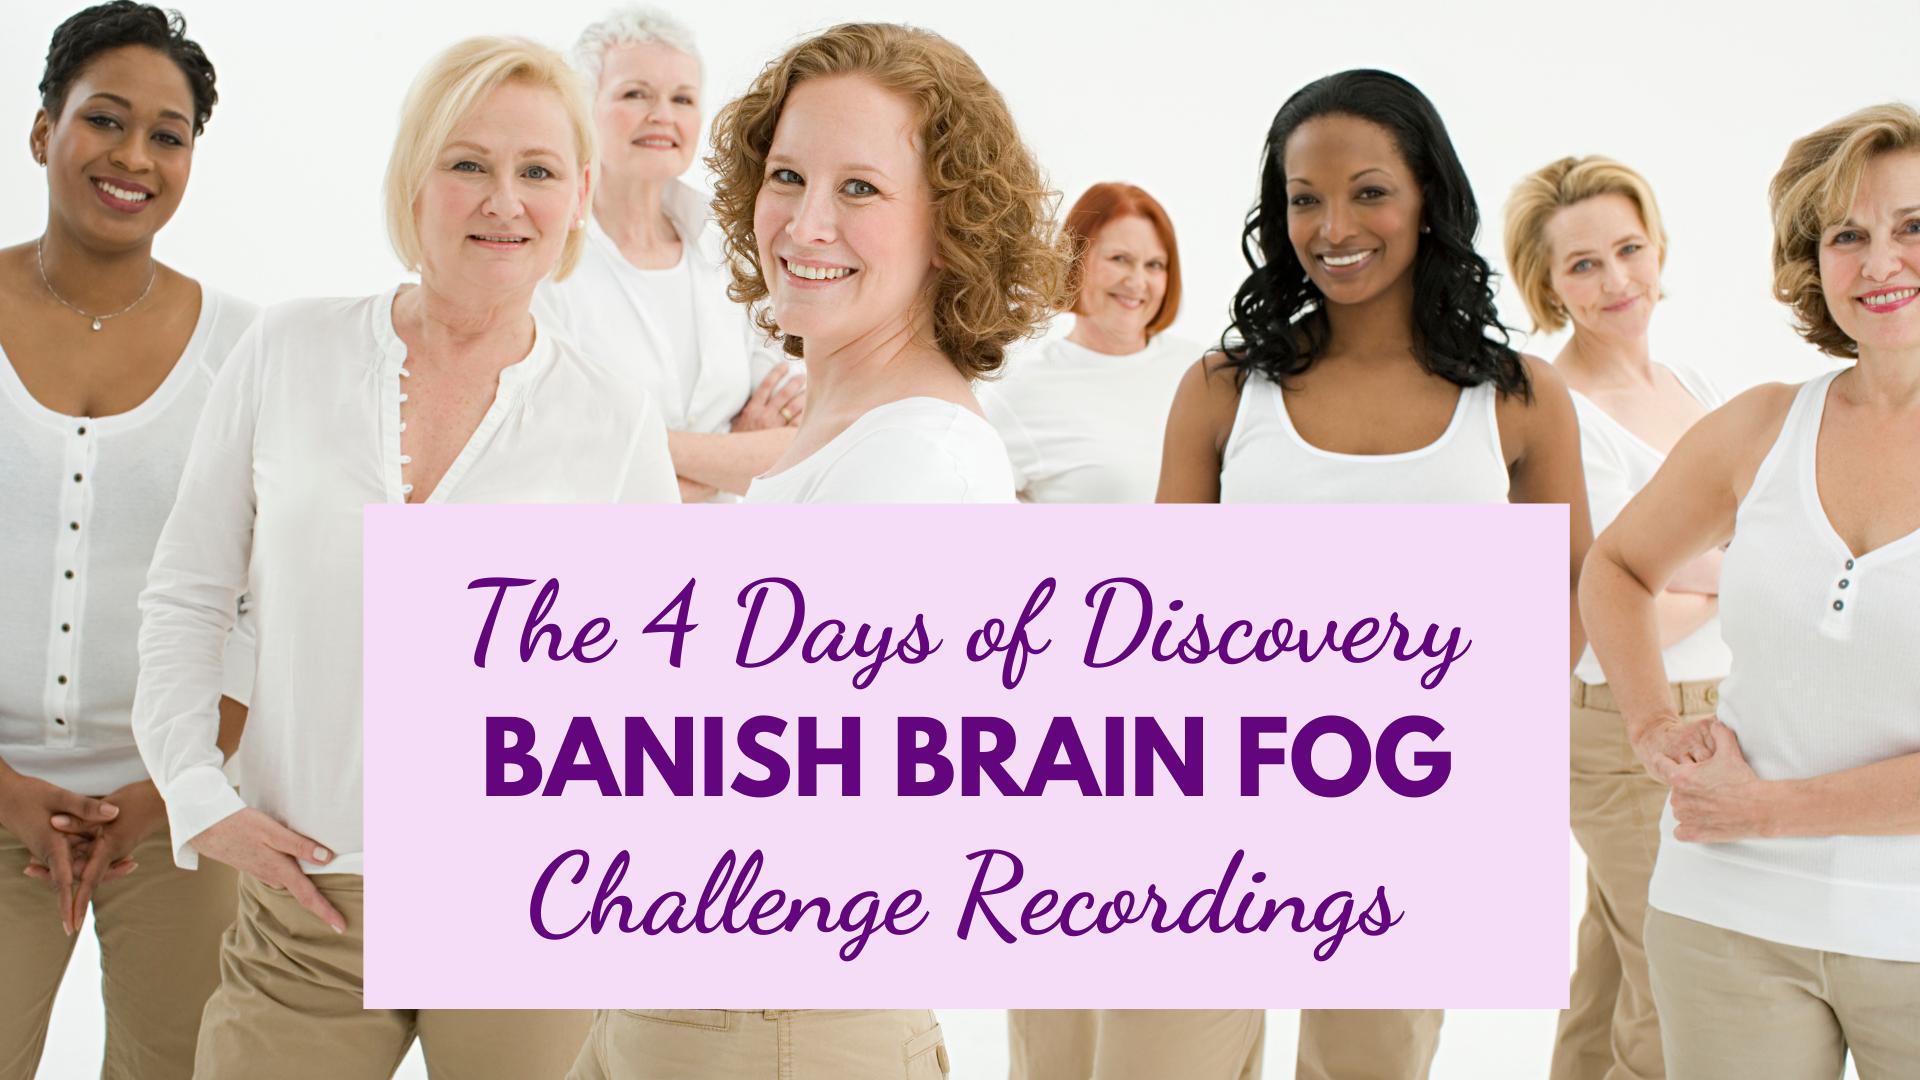 Banish Brain Fog Challaenge